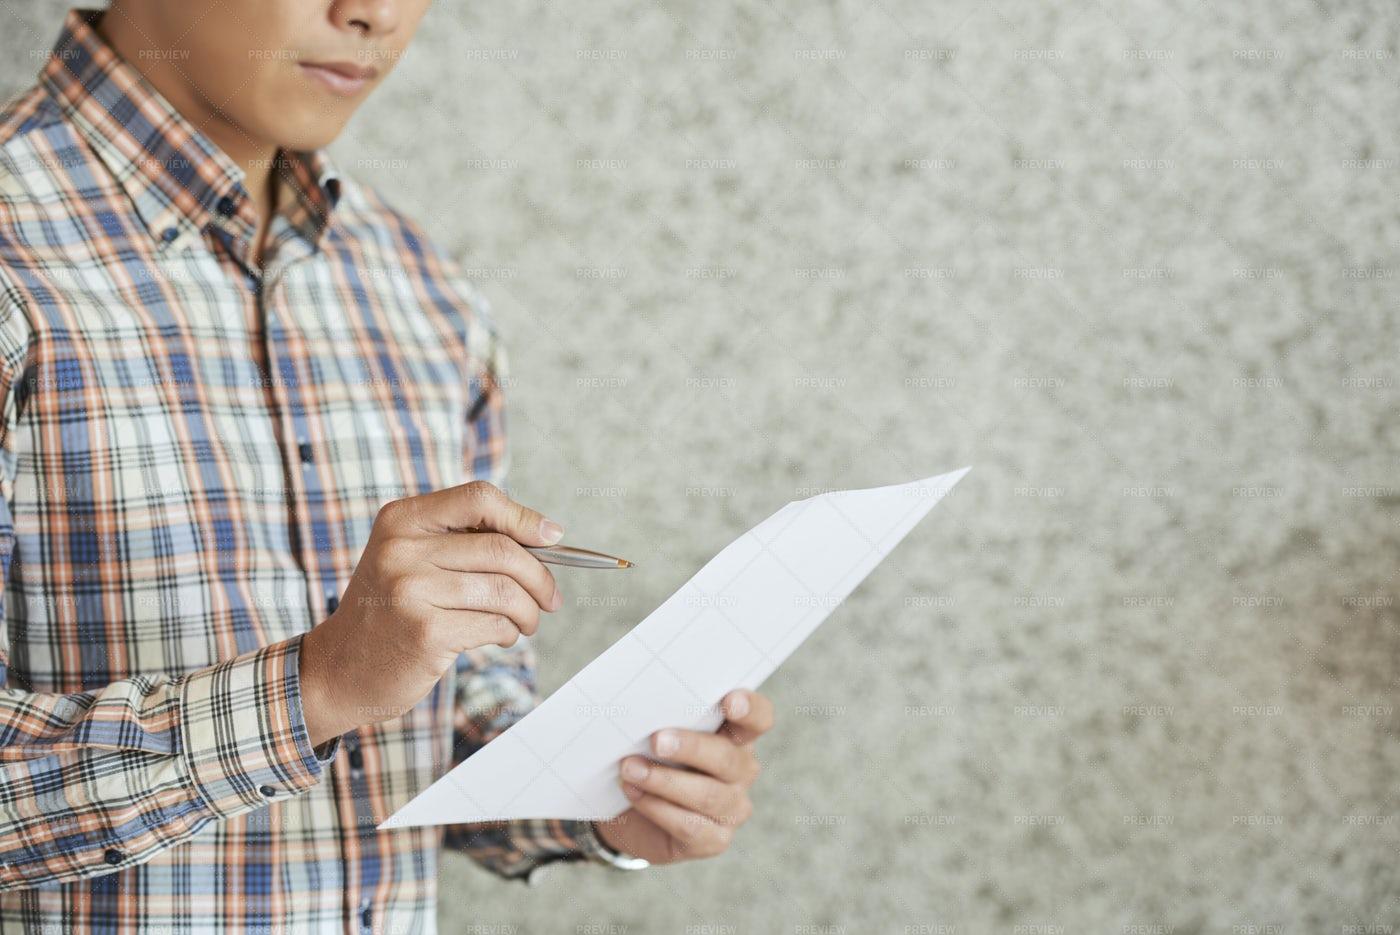 Entrepreneur Checking Business Document: Stock Photos